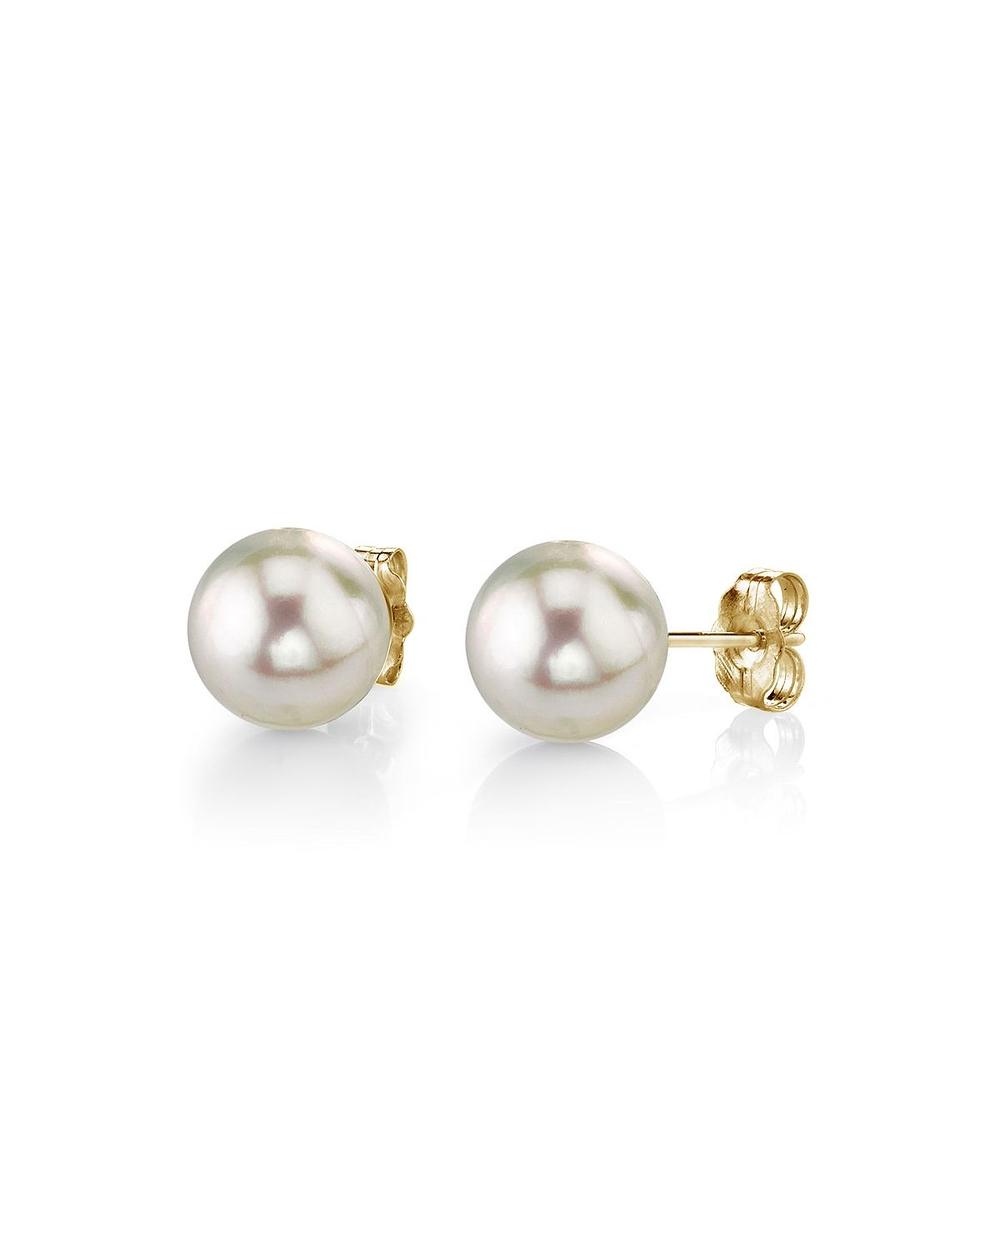 5 0 5 5mm white akoya pearl stud earrings